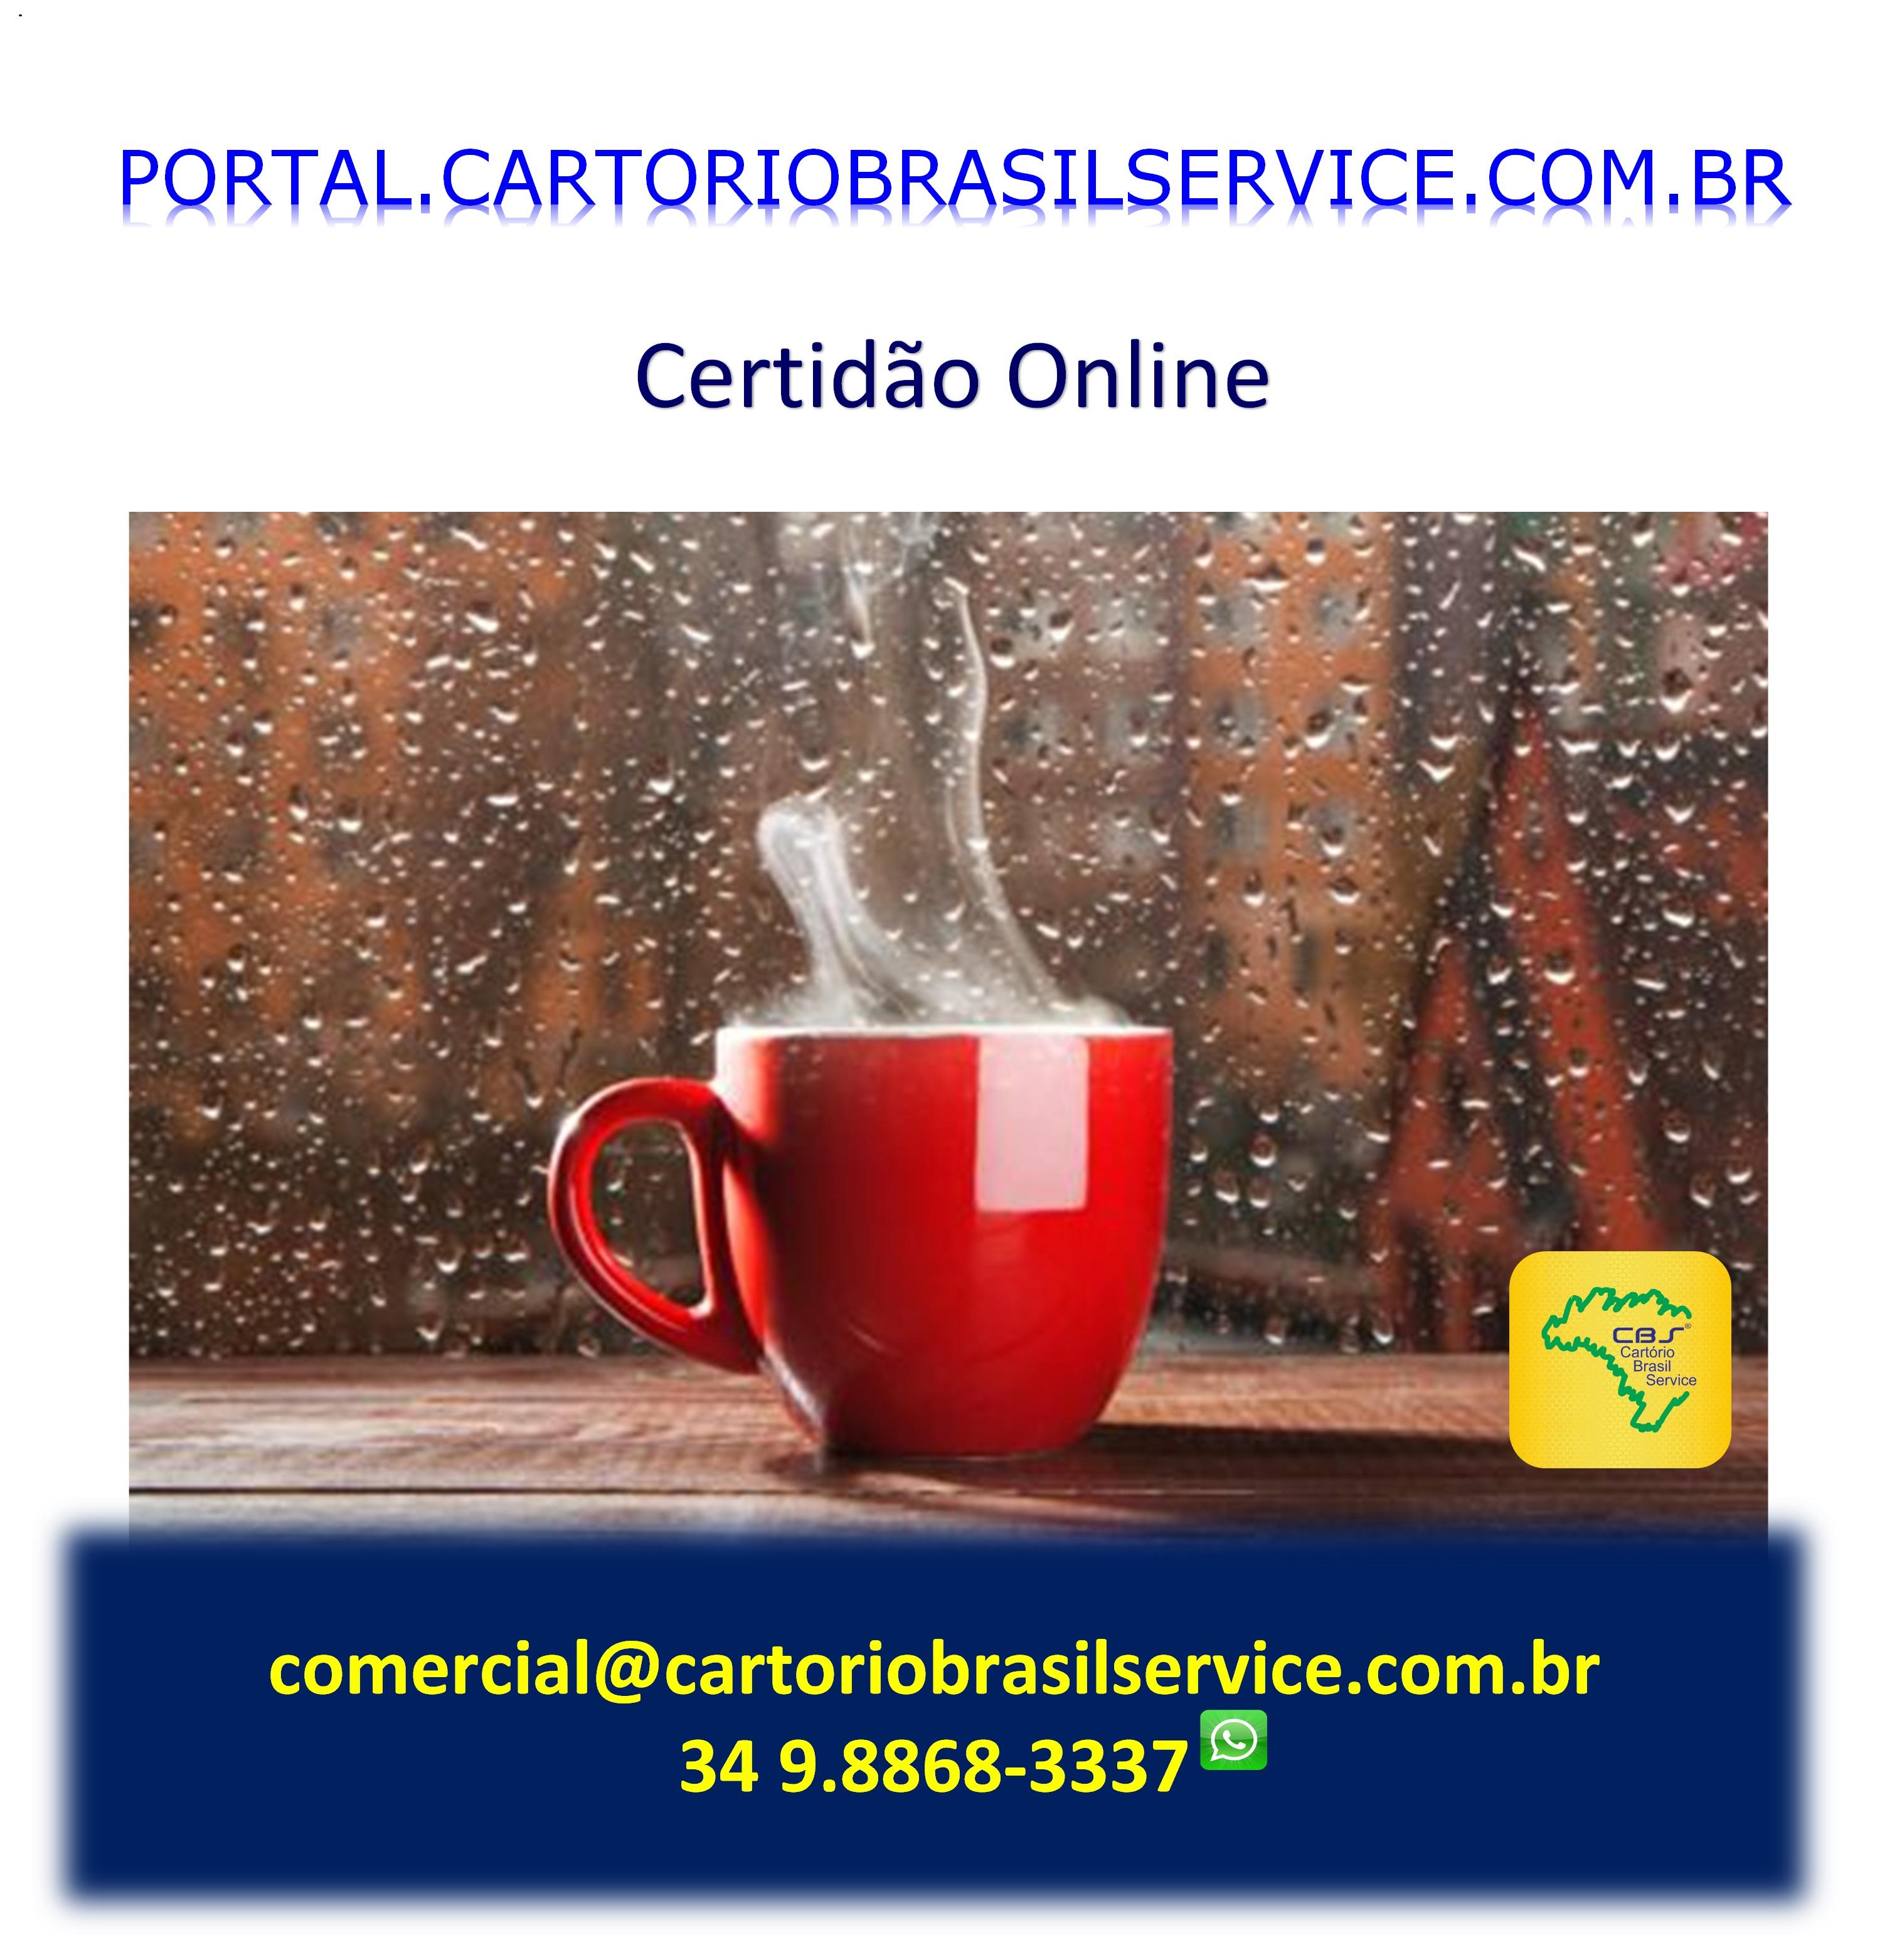 Cartório Brasil Service Cetidões Online Fácil